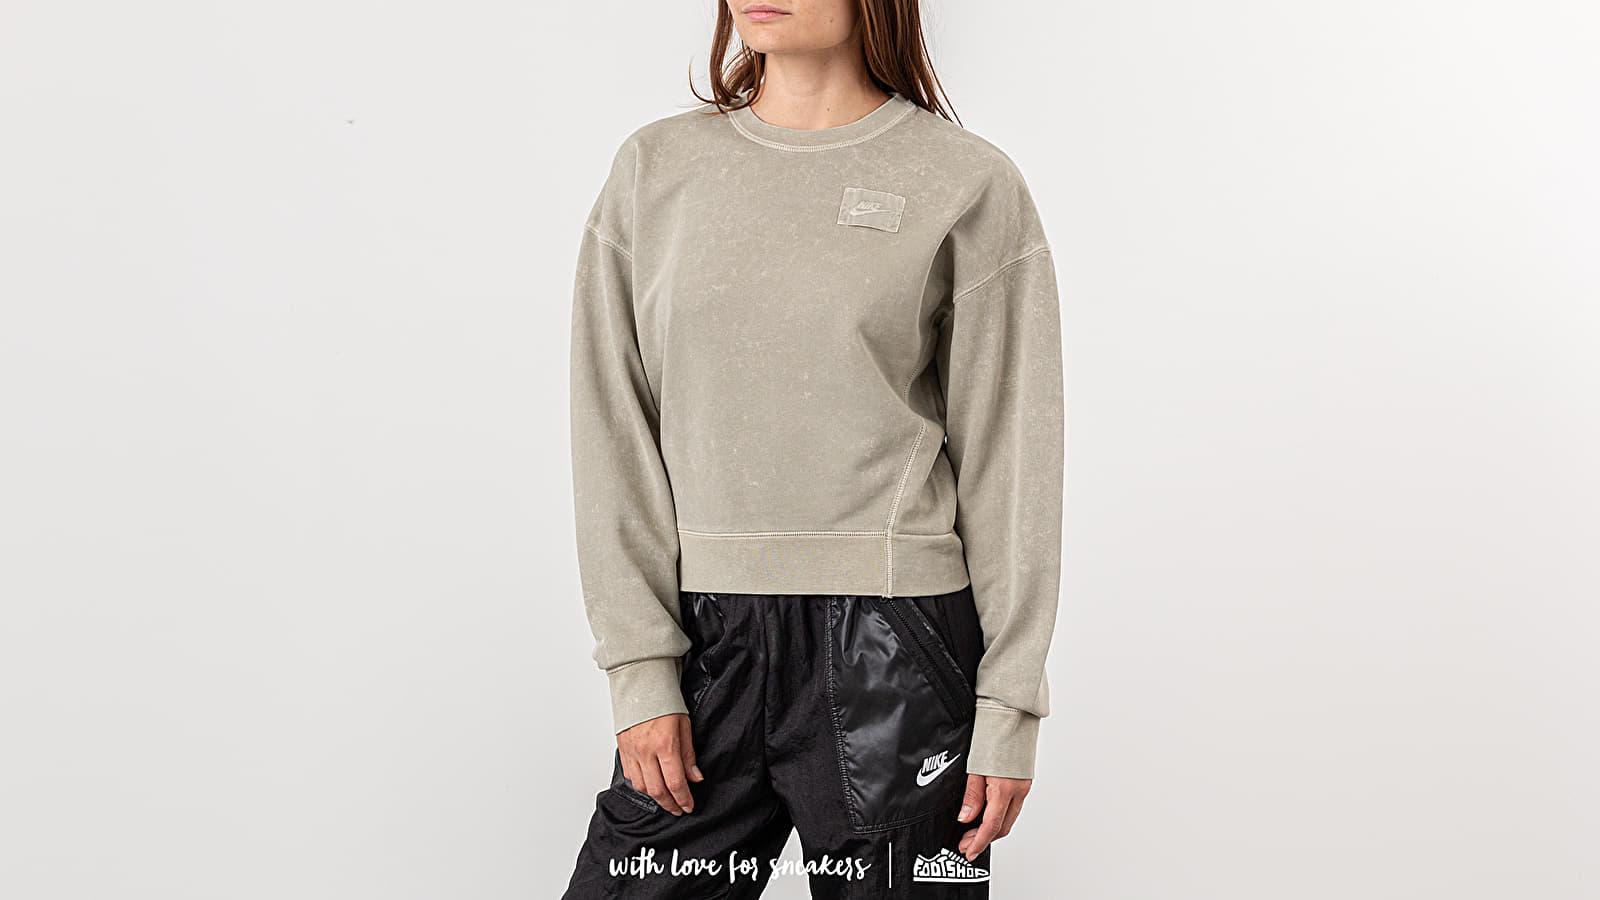 8aee1e5a Nike Sportswear Rebel Crewneck Jade Horizon at a great price $65 buy at  Footshop